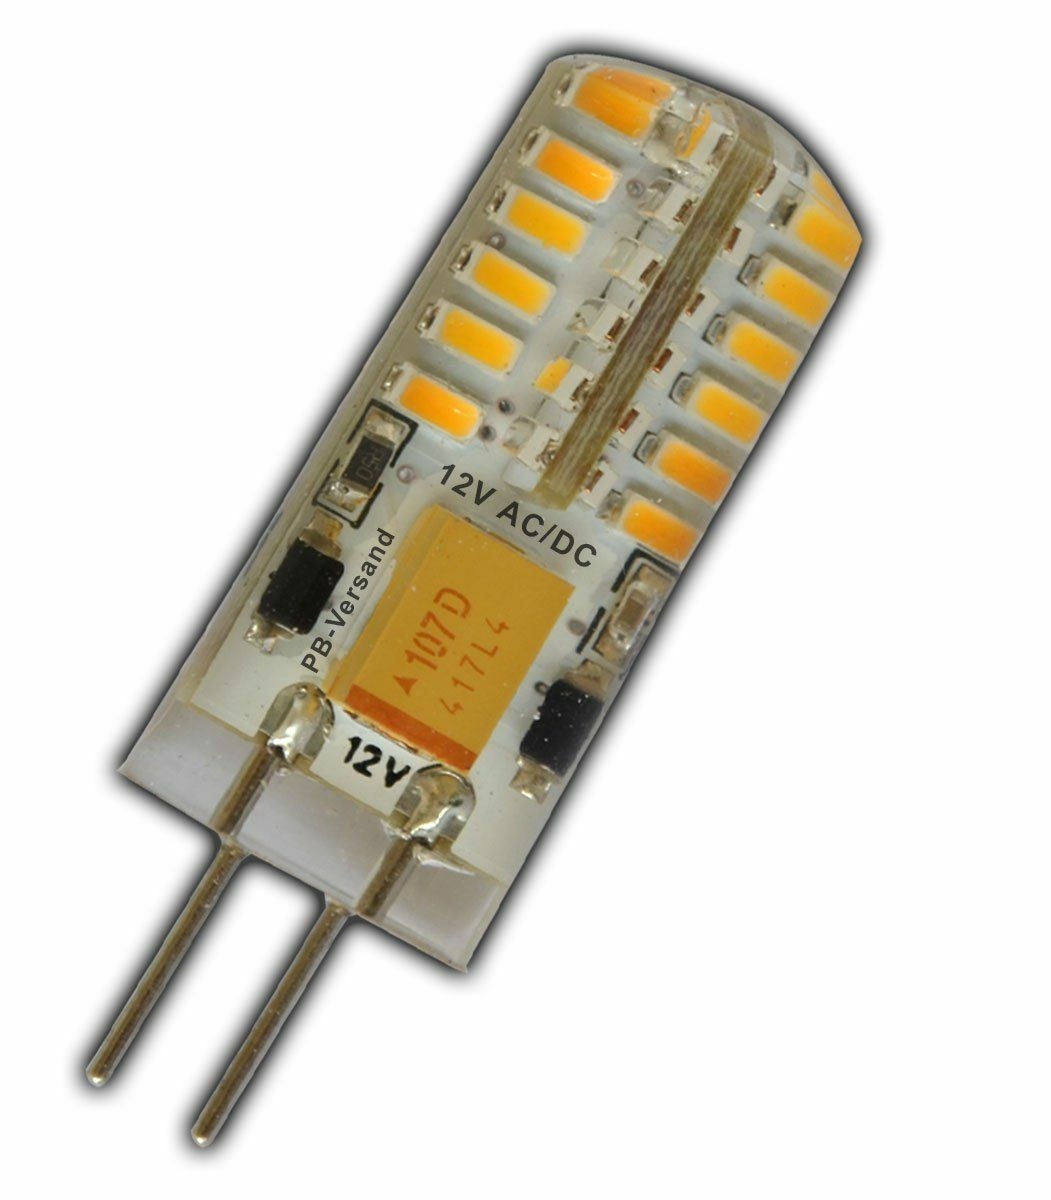 G4 LED Capsule Lamps 2w 12v 27000k 25,000 Hrs Life AC DC